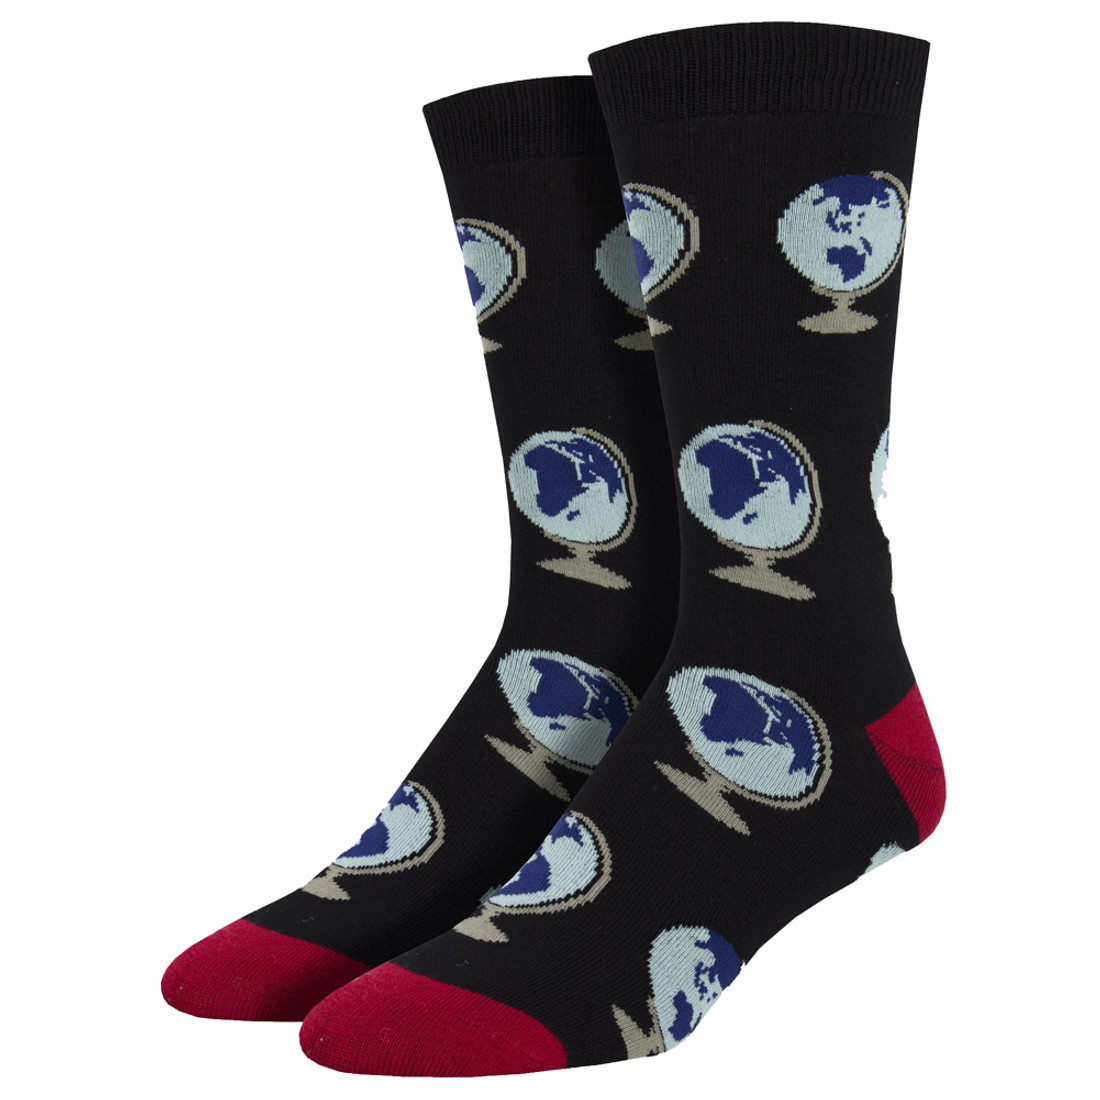 Around The World Globes Men's Crew Socks